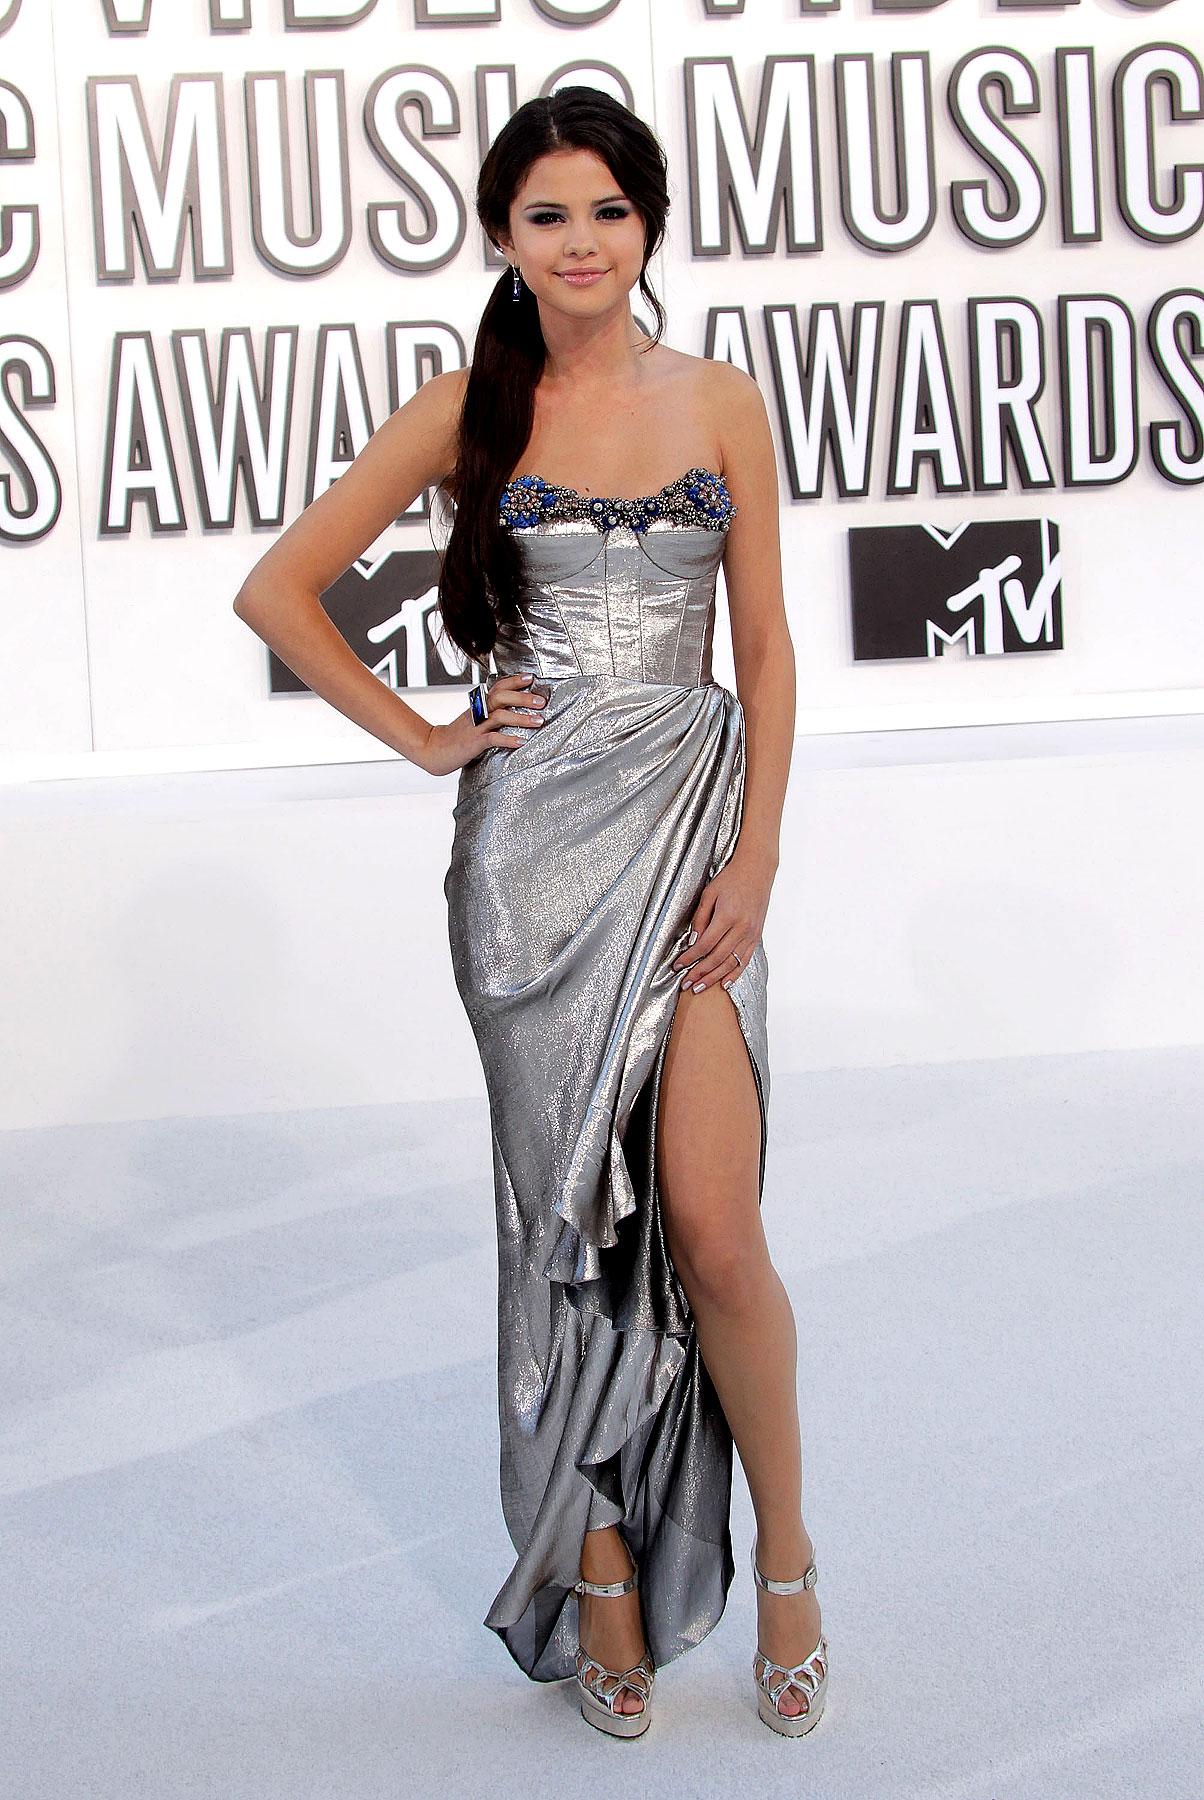 Selena Gomez at 2010 MTV Video Music Awards (PHOTOS)